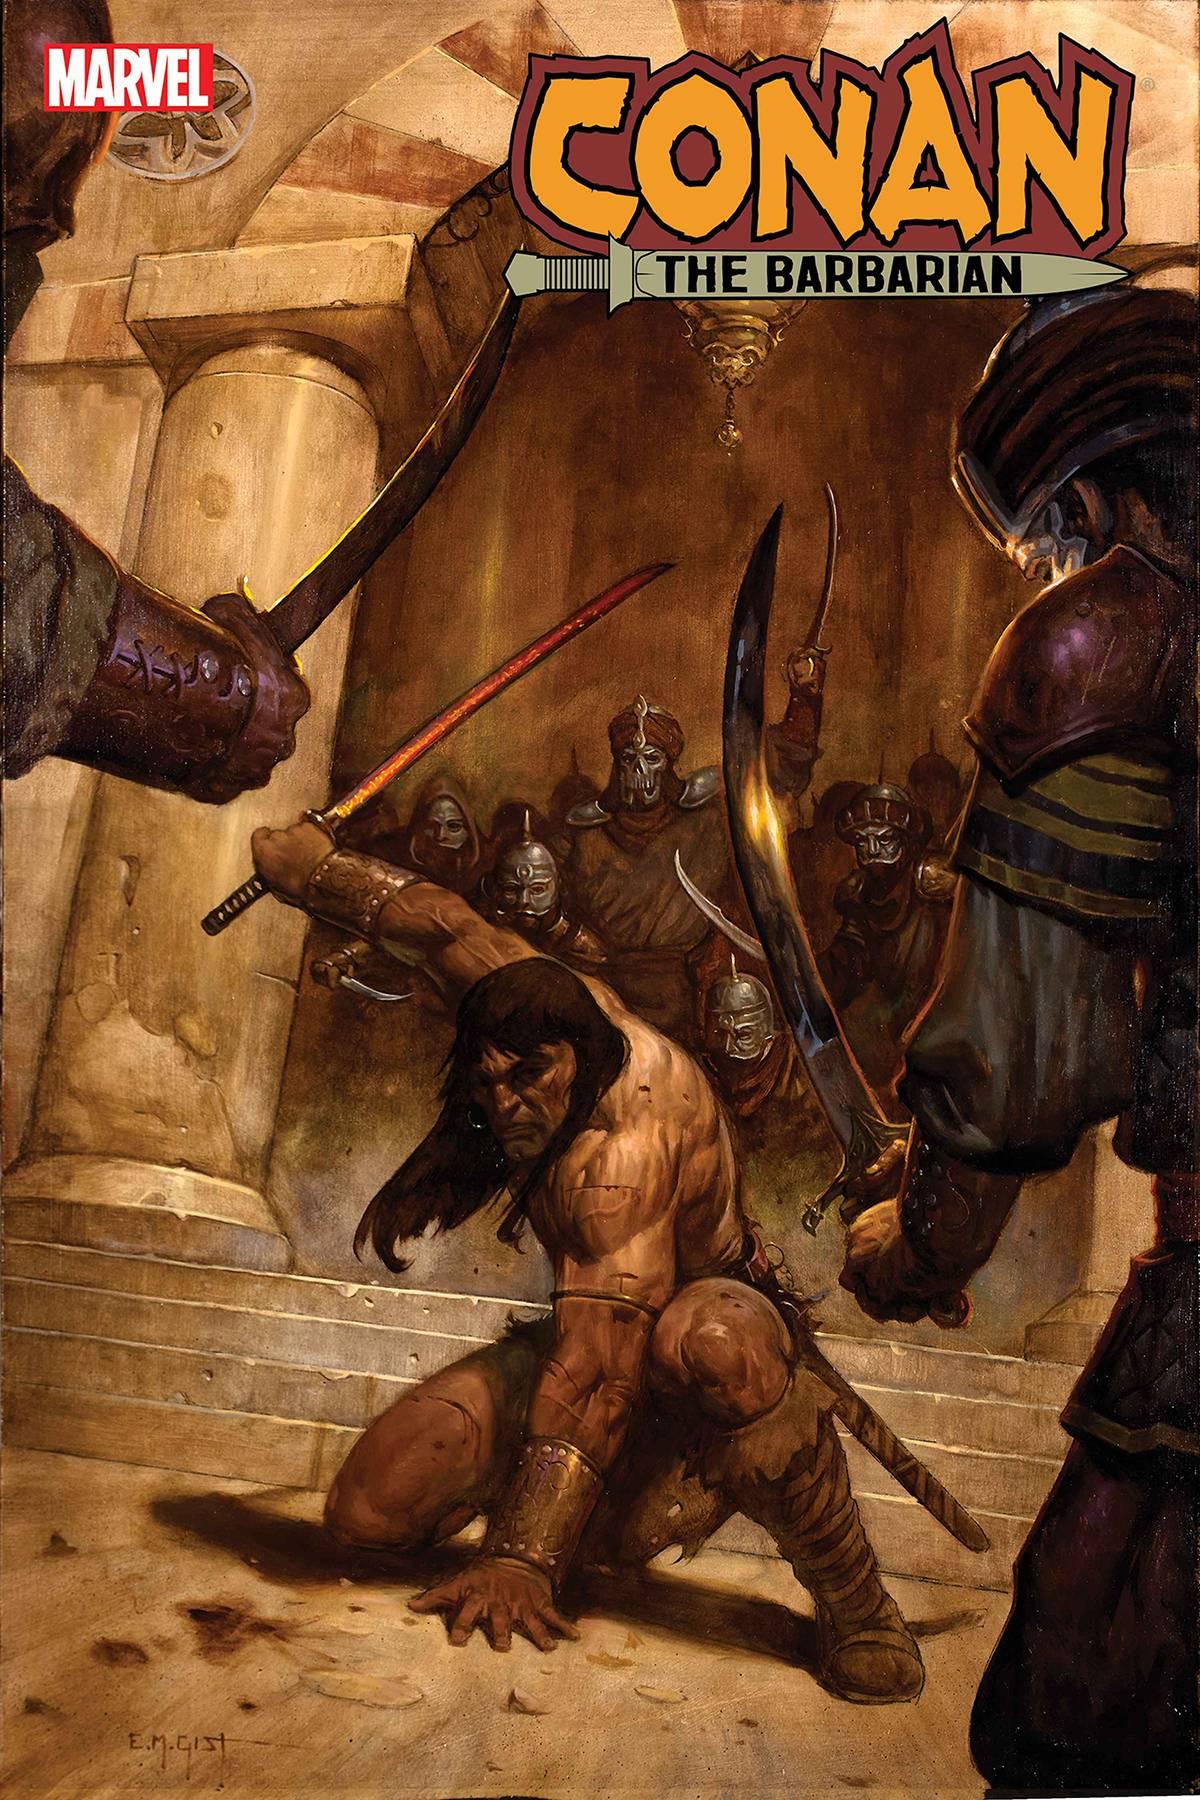 Conan The Barbarian #16 (2020)